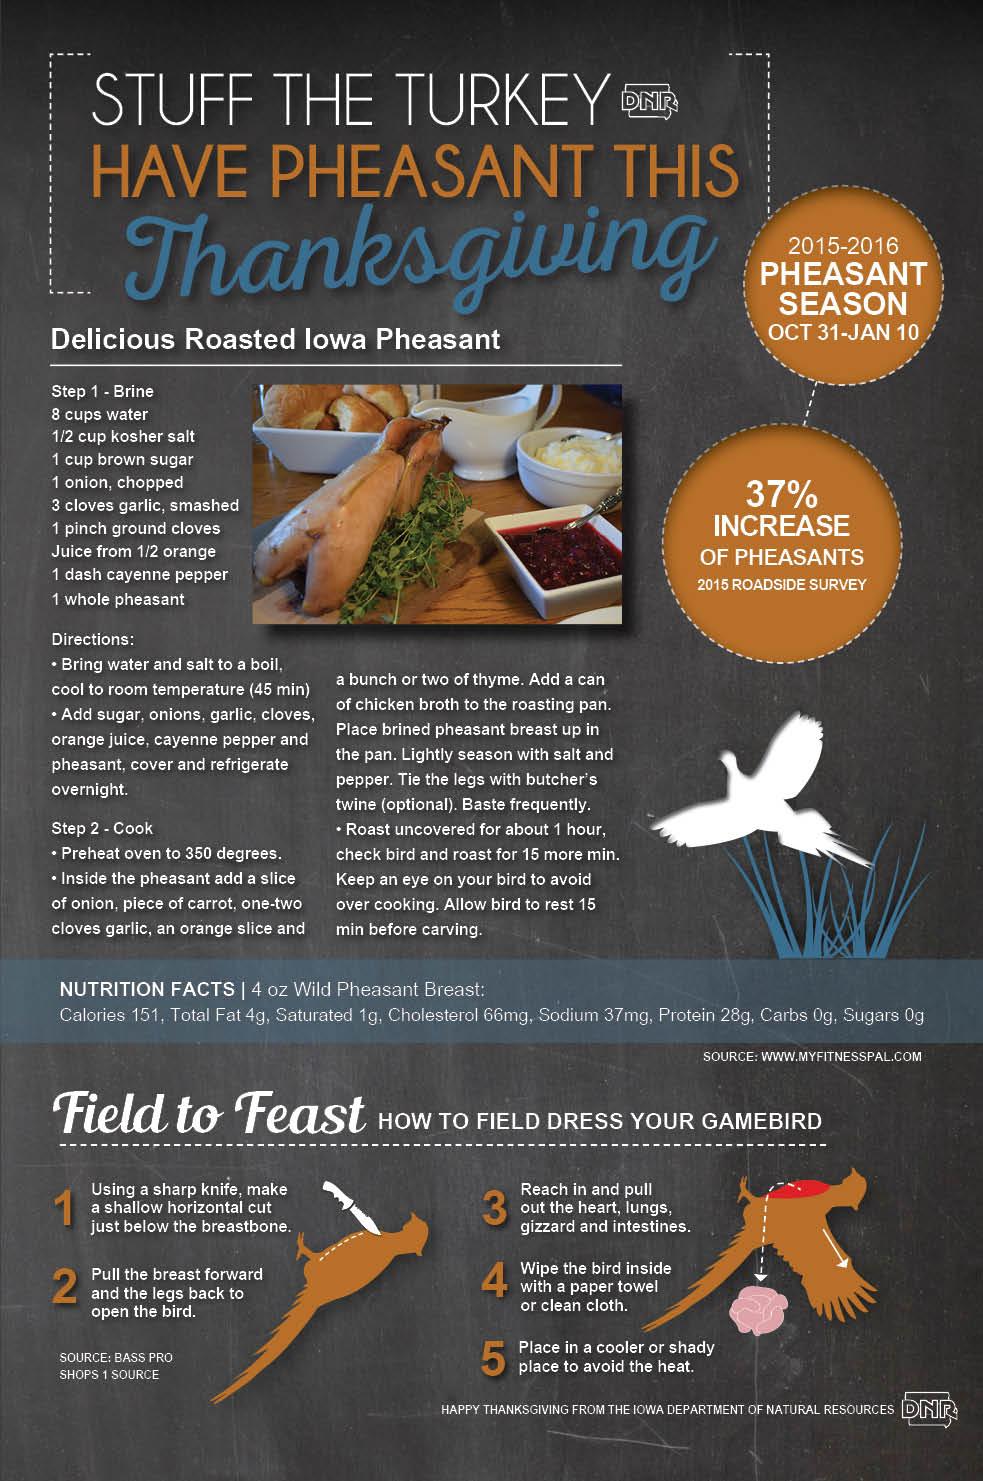 Stuff turkey this Thanksgiving and serve pheasant instead! Delicious Roasted Pheasant recipe | Iowa DNR